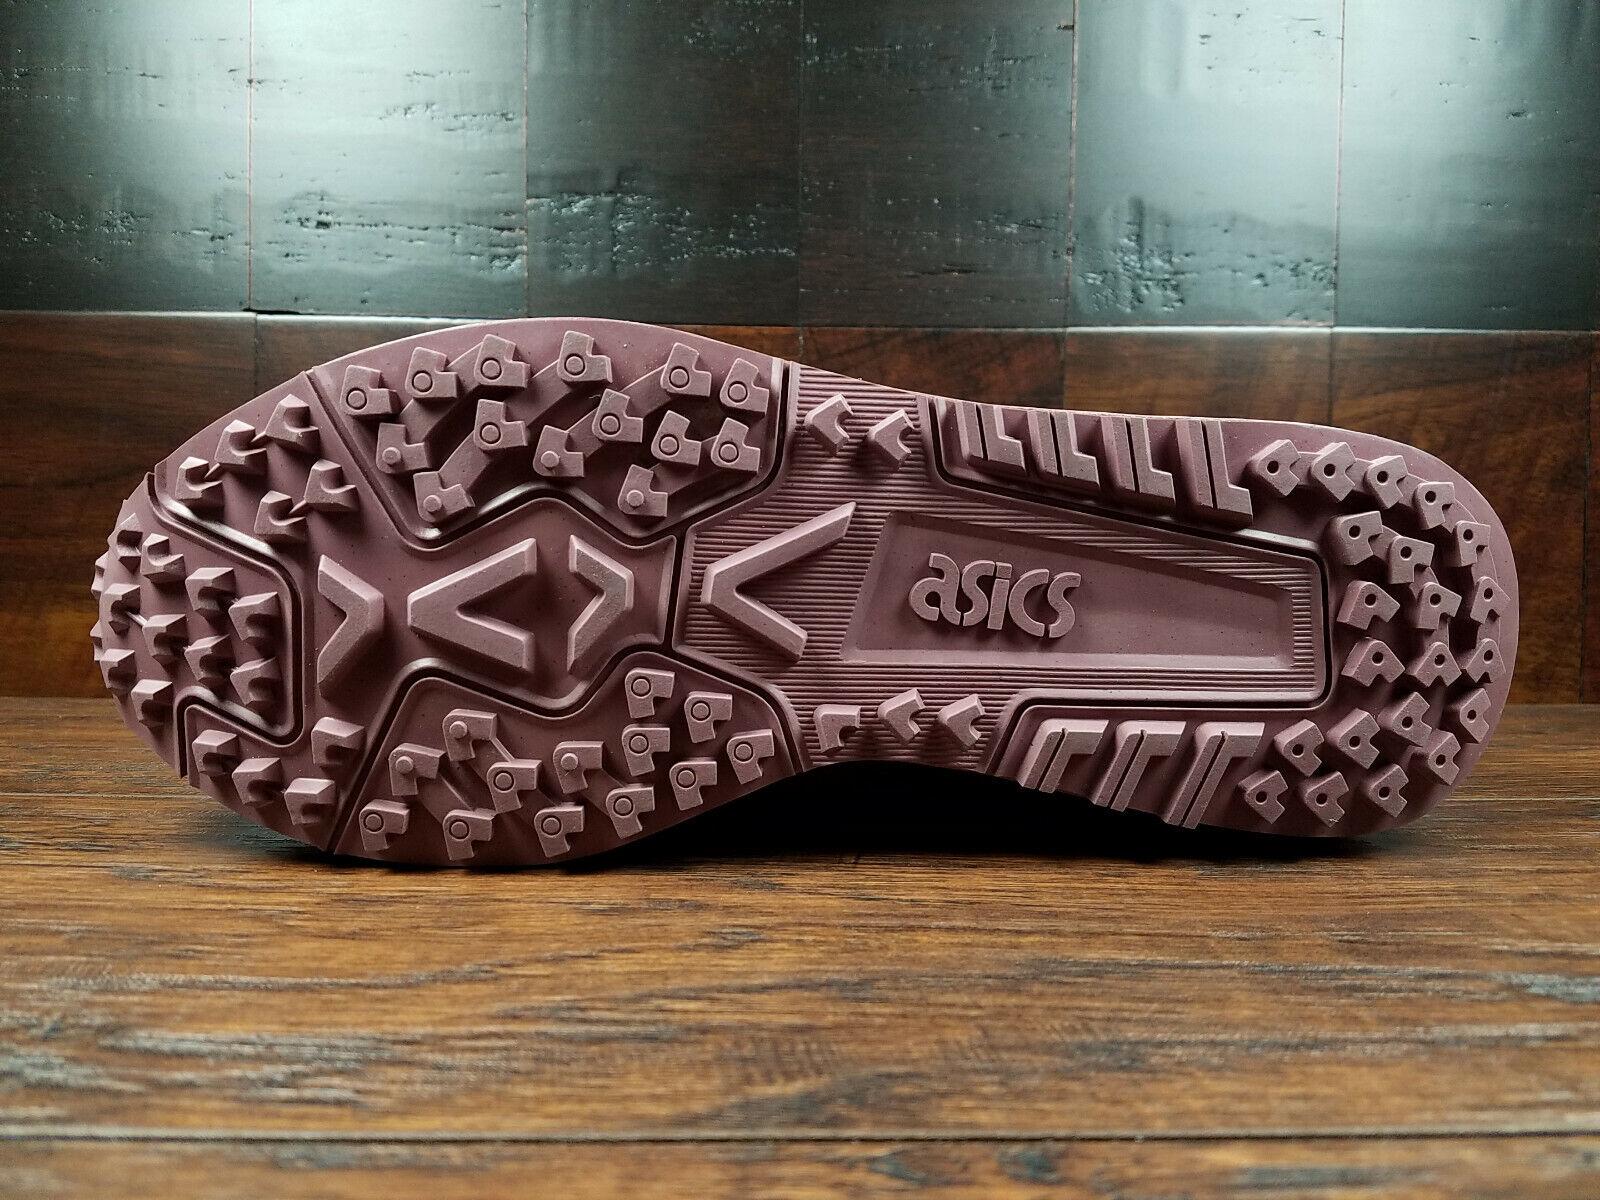 c01ede2c269d ... Asics GEL-LYTE MT (pink Taupe) Sneaker Sneaker Sneaker Boot  H8J1L-